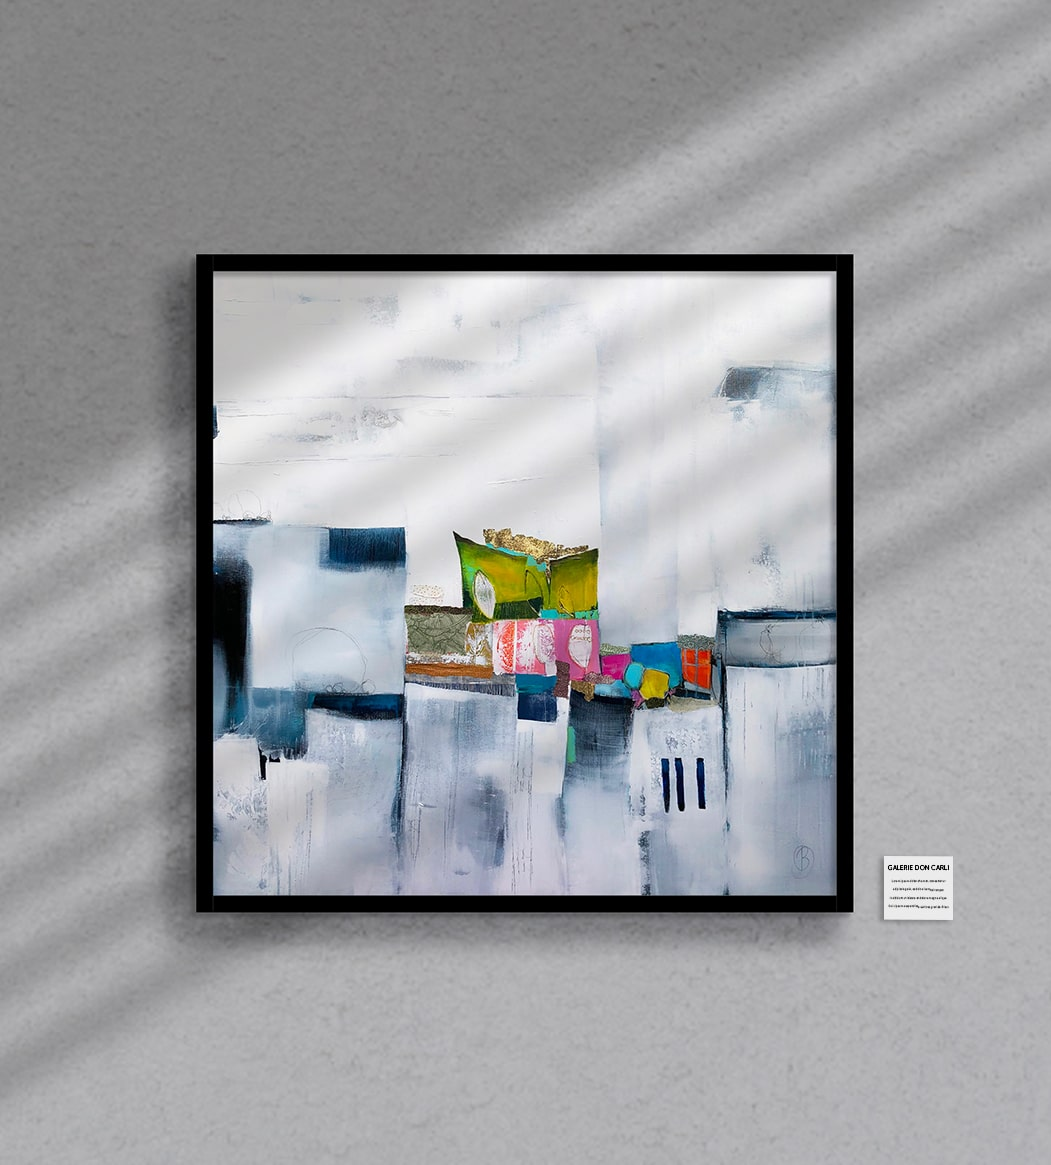 Lau Blou Galerie d'art Don Carli Lyon